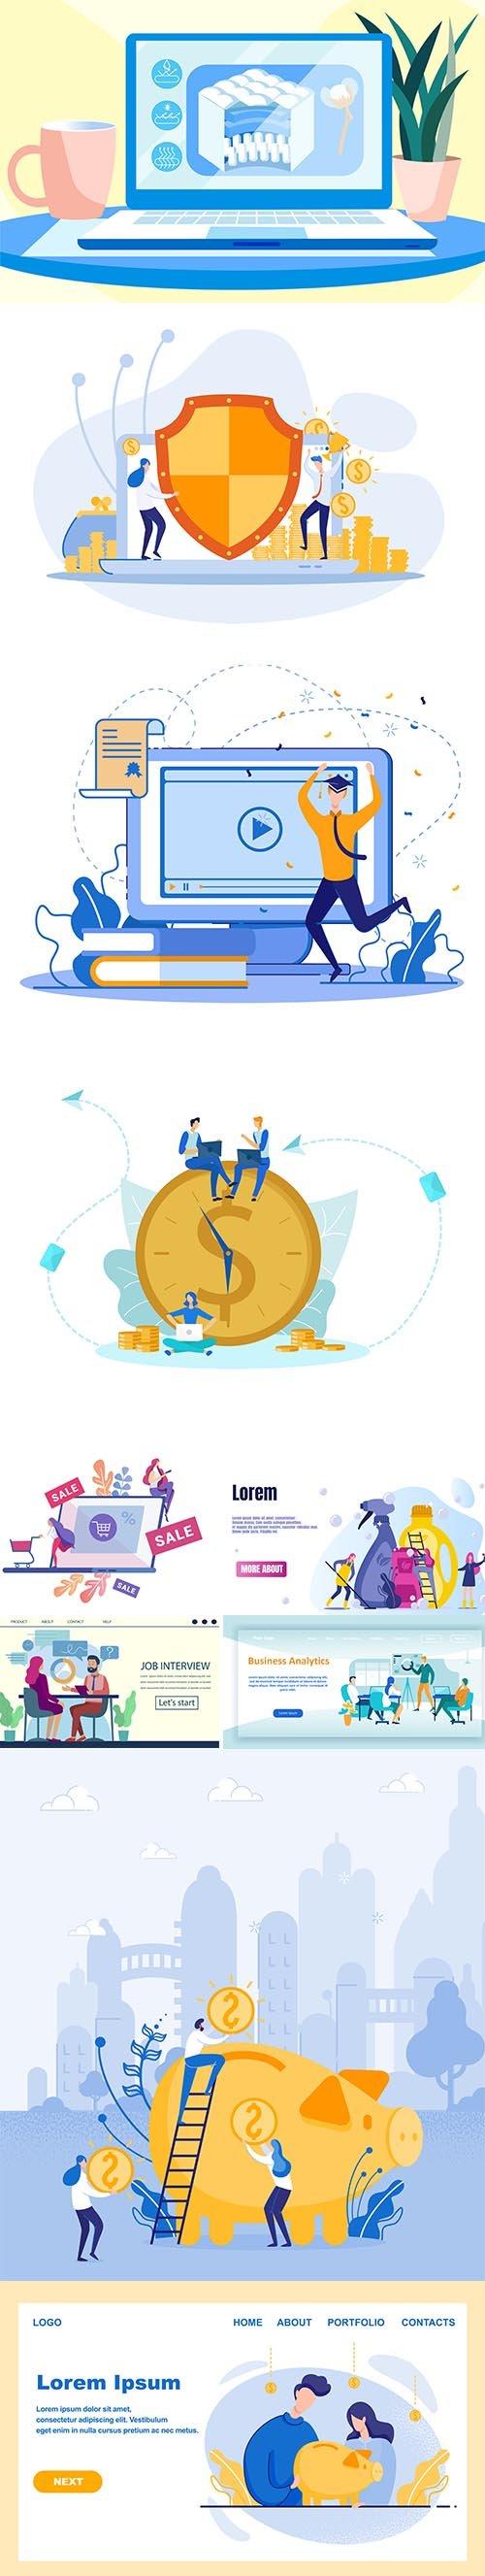 Business Illustrations Flat Vector